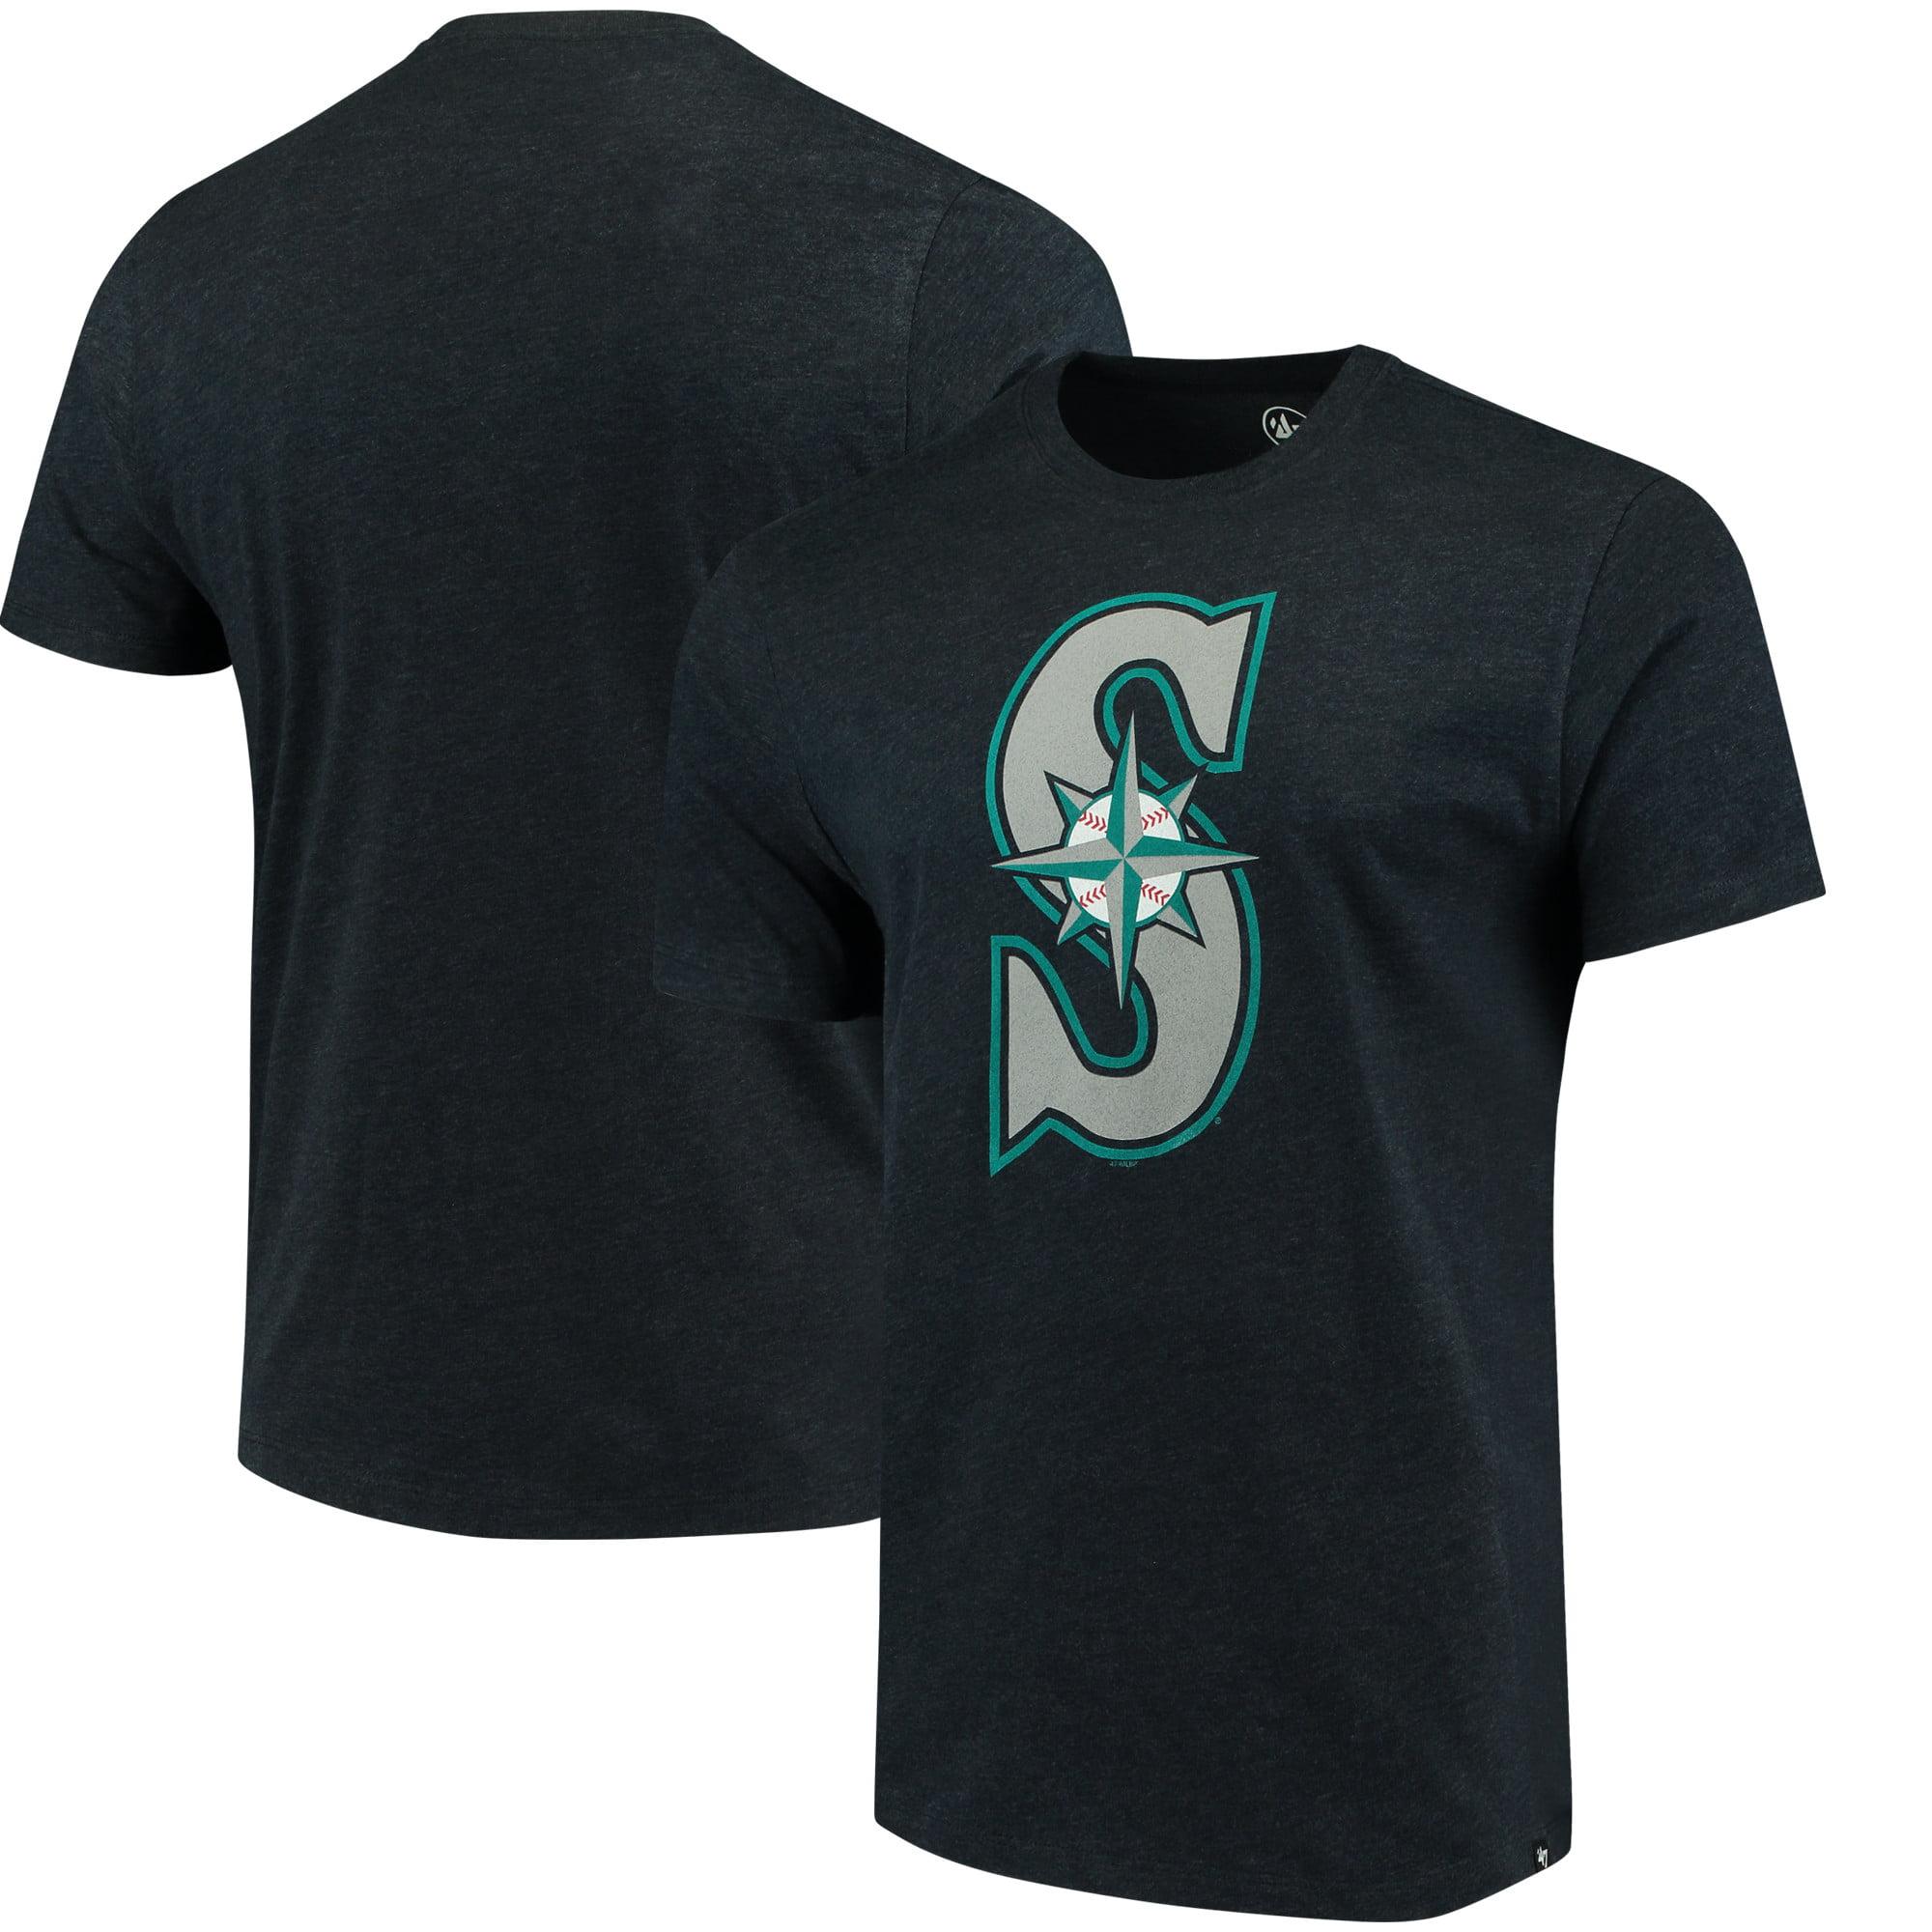 Seattle Mariners '47 Club T-Shirt - Navy